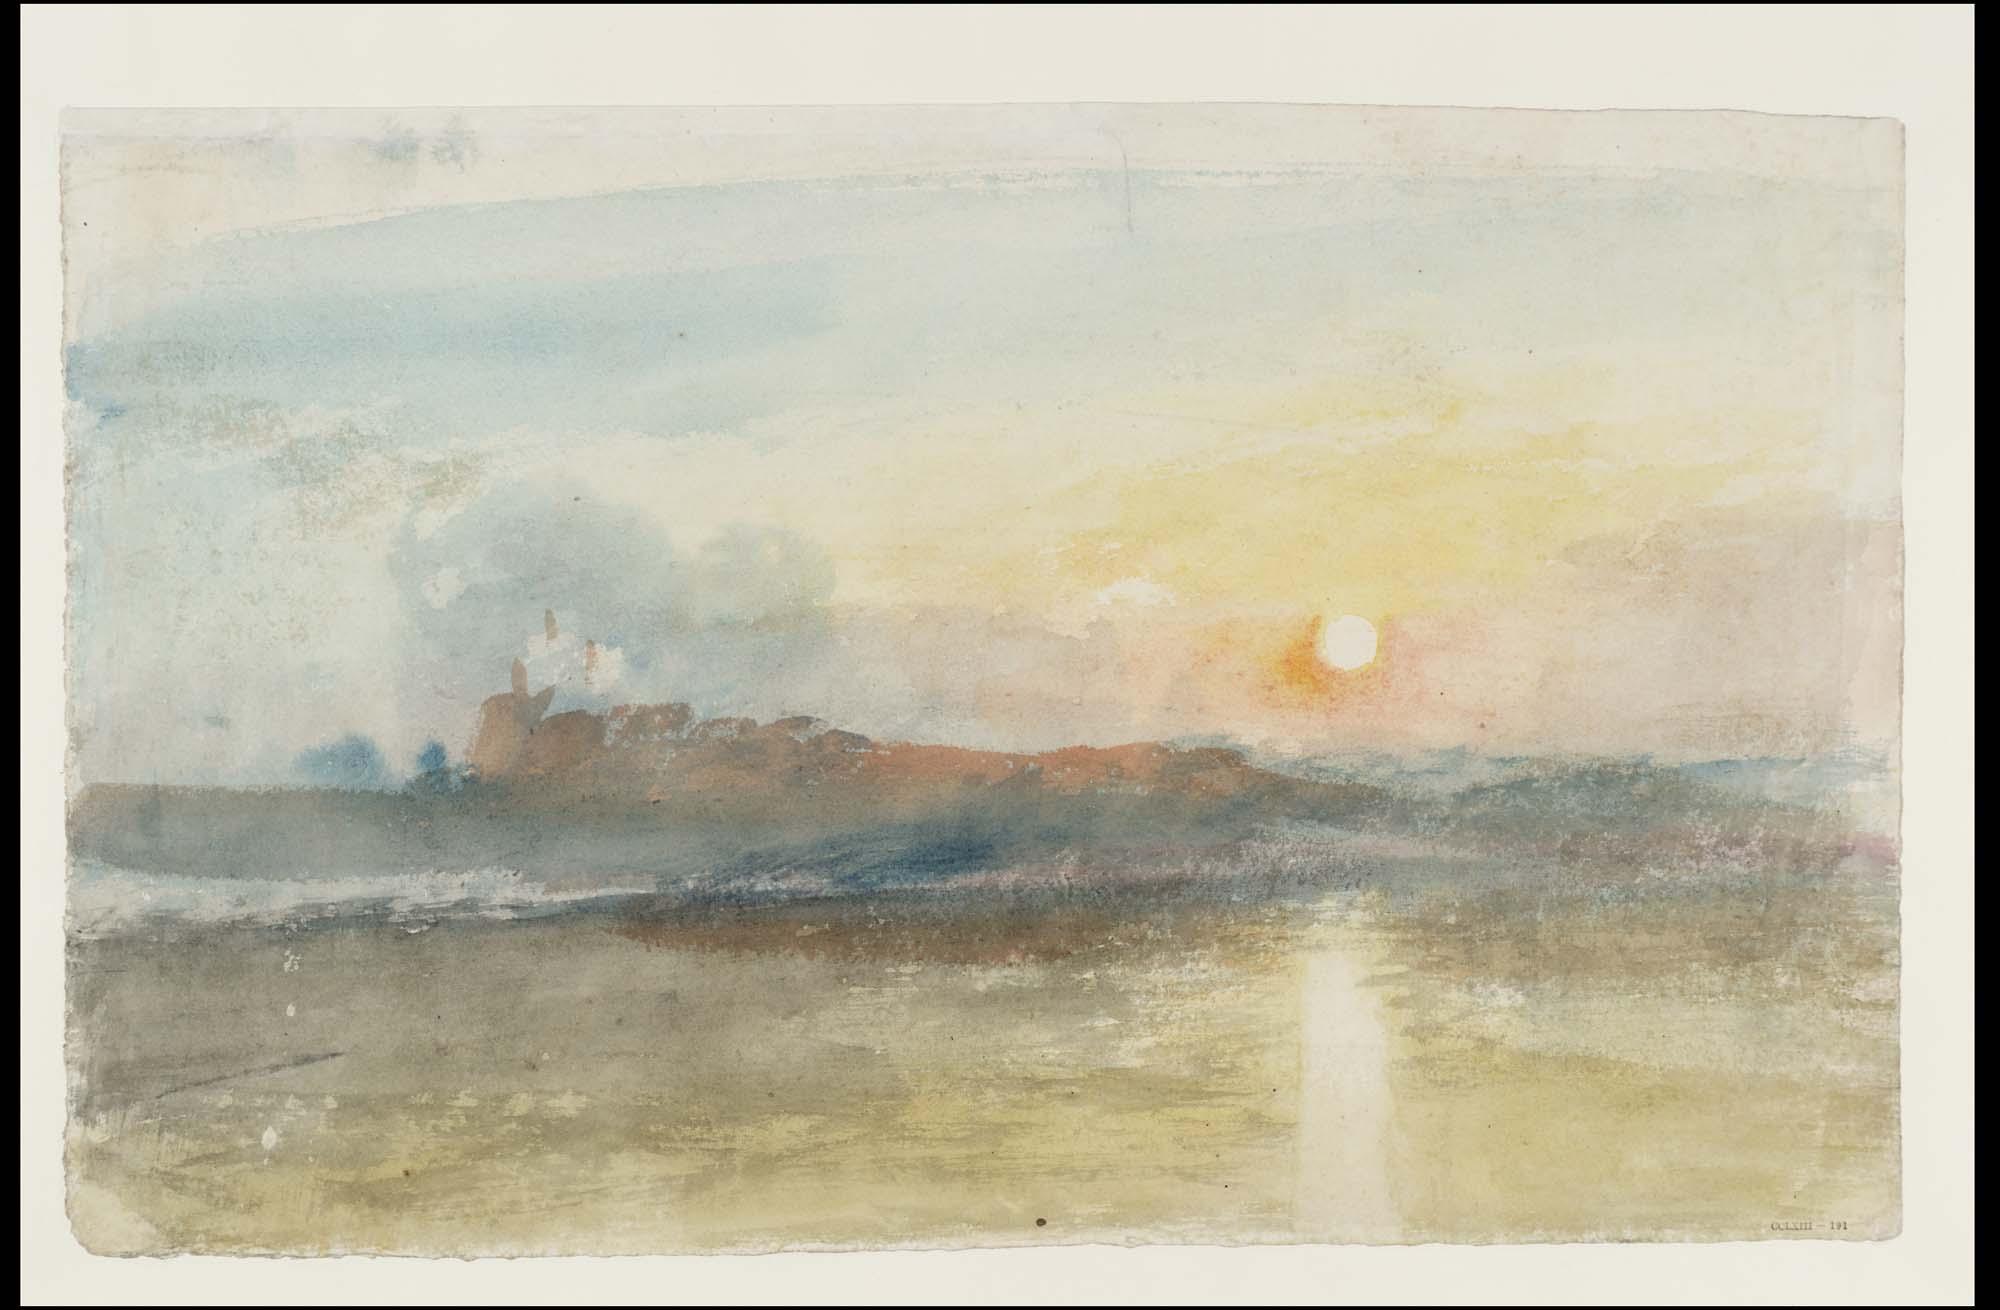 a watercolour of a distant castle seen across a river